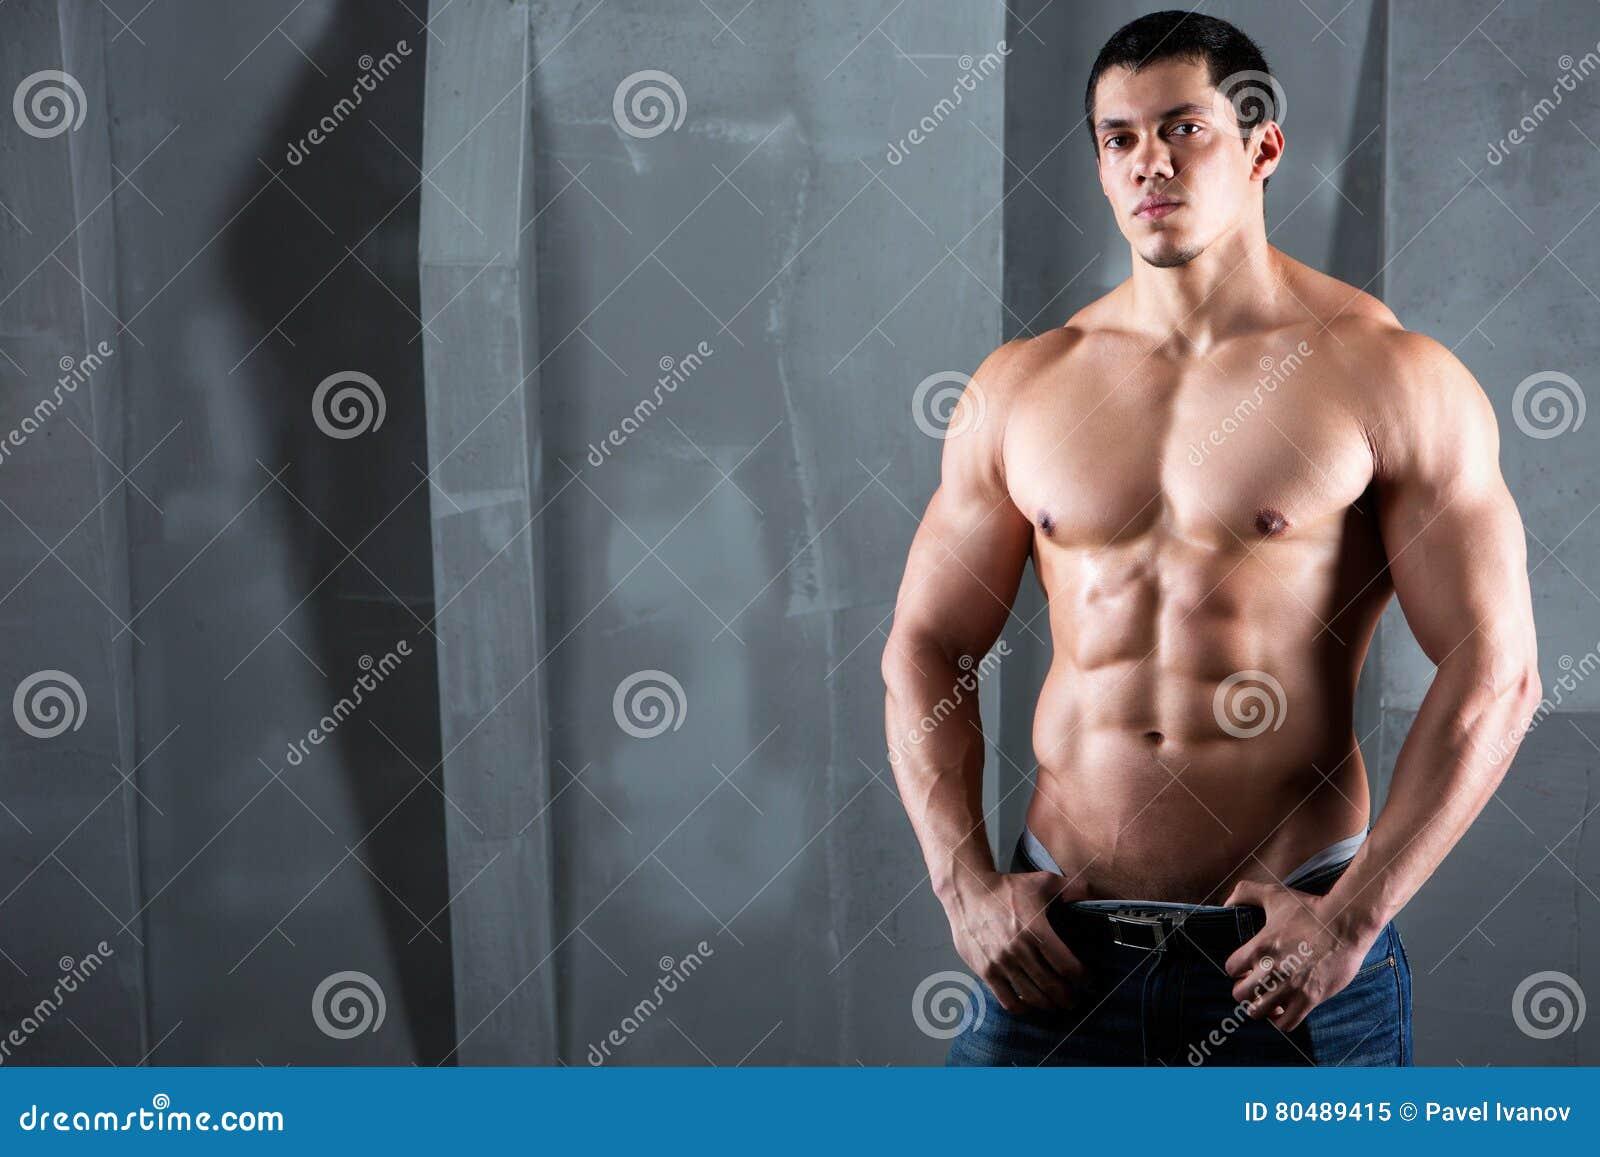 Sexy half naked man